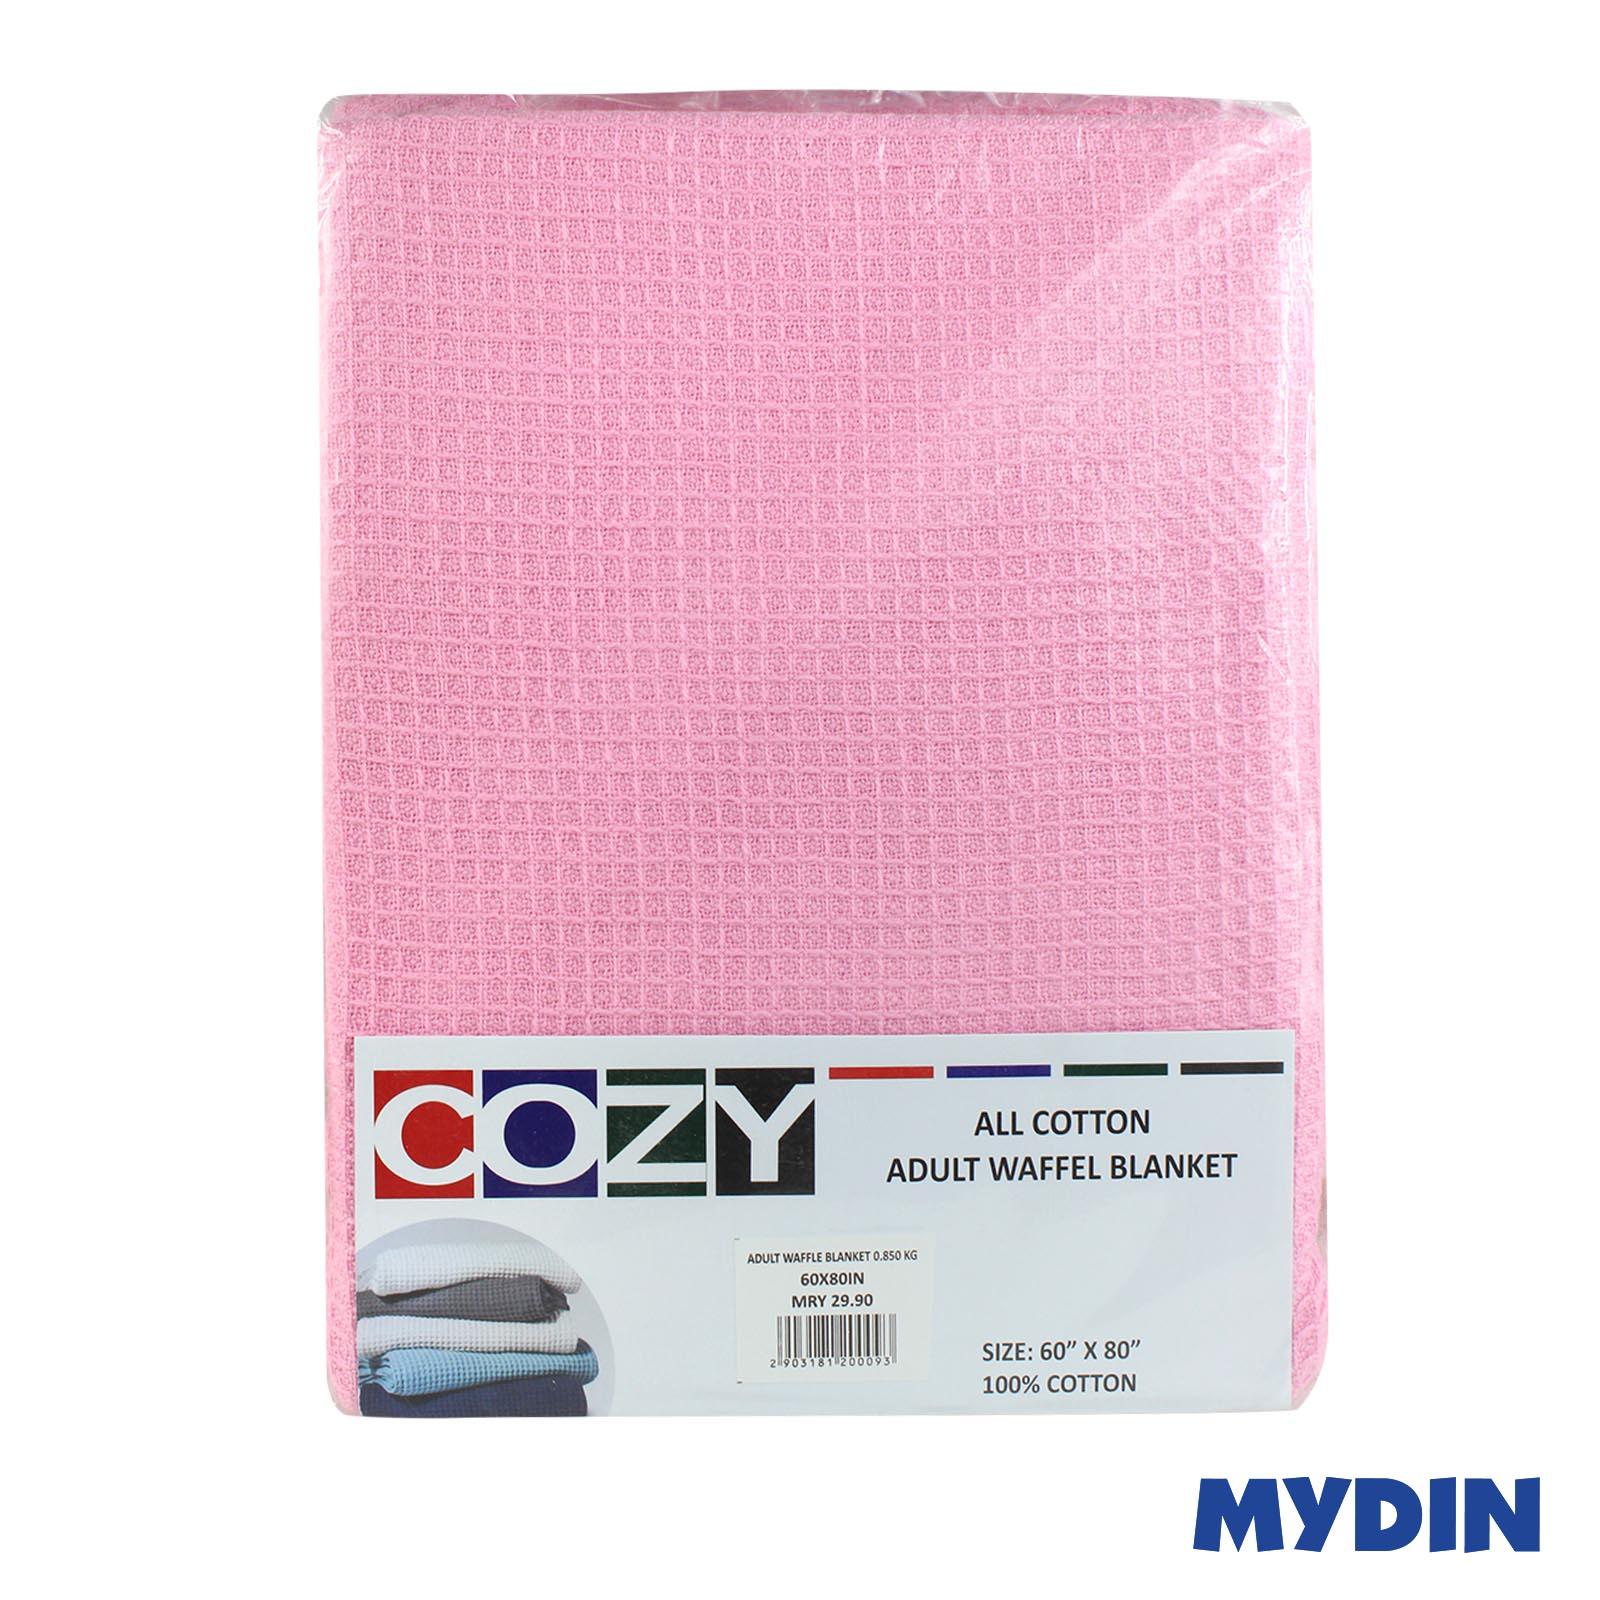 "Cozy All Cotton Adult Waffel Light Pink Blanket 60""x80"" 850g BLWF01"